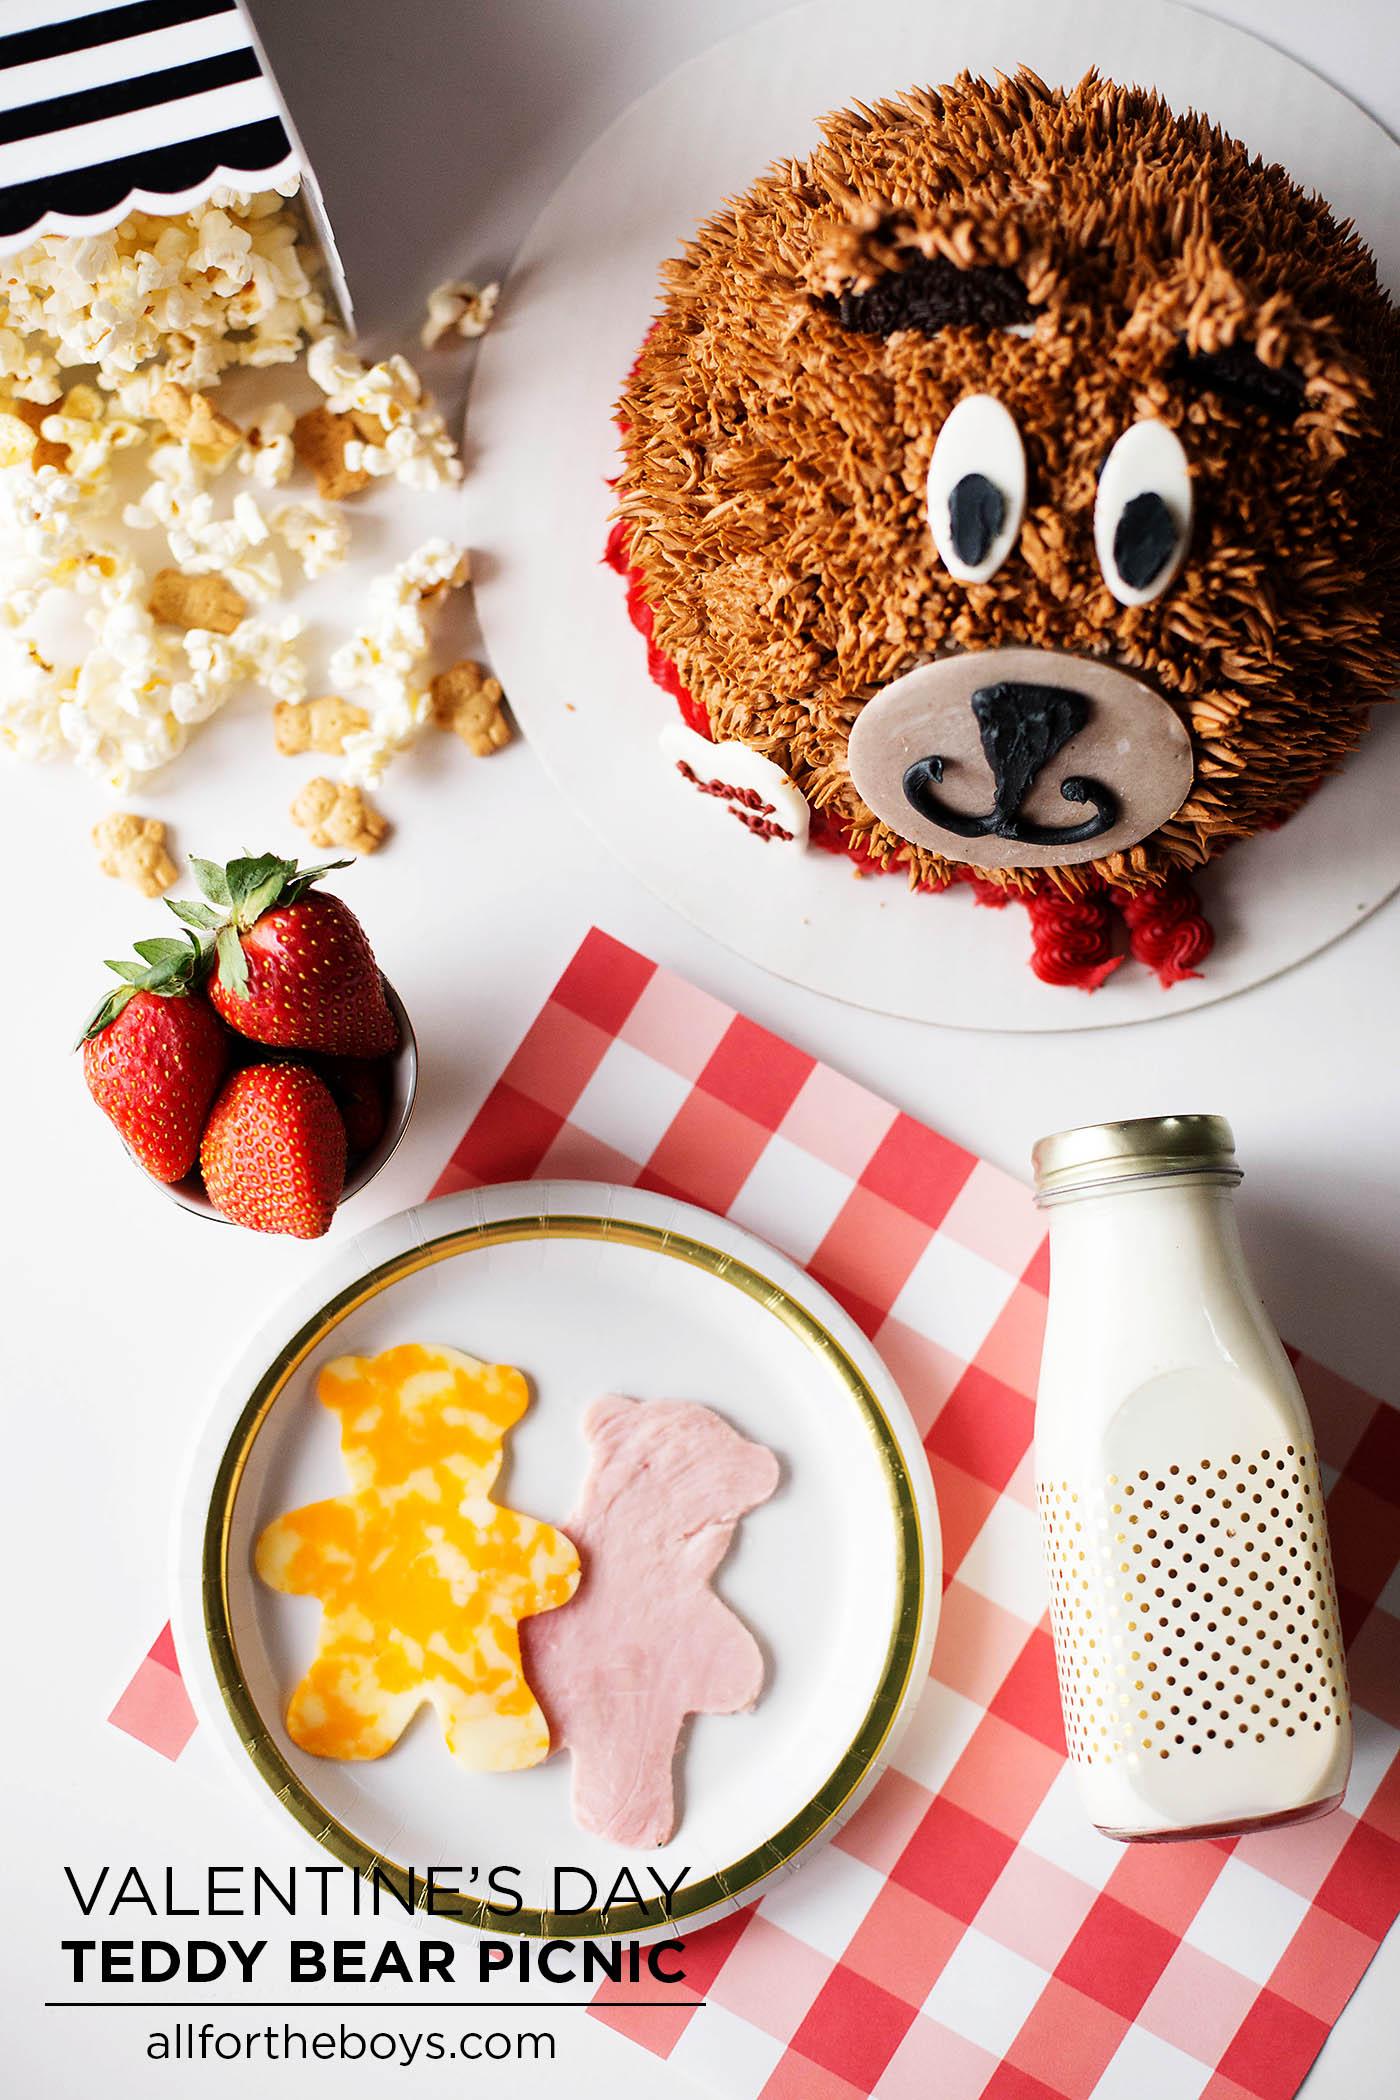 Valentine's Day Teddy Bear Picnic